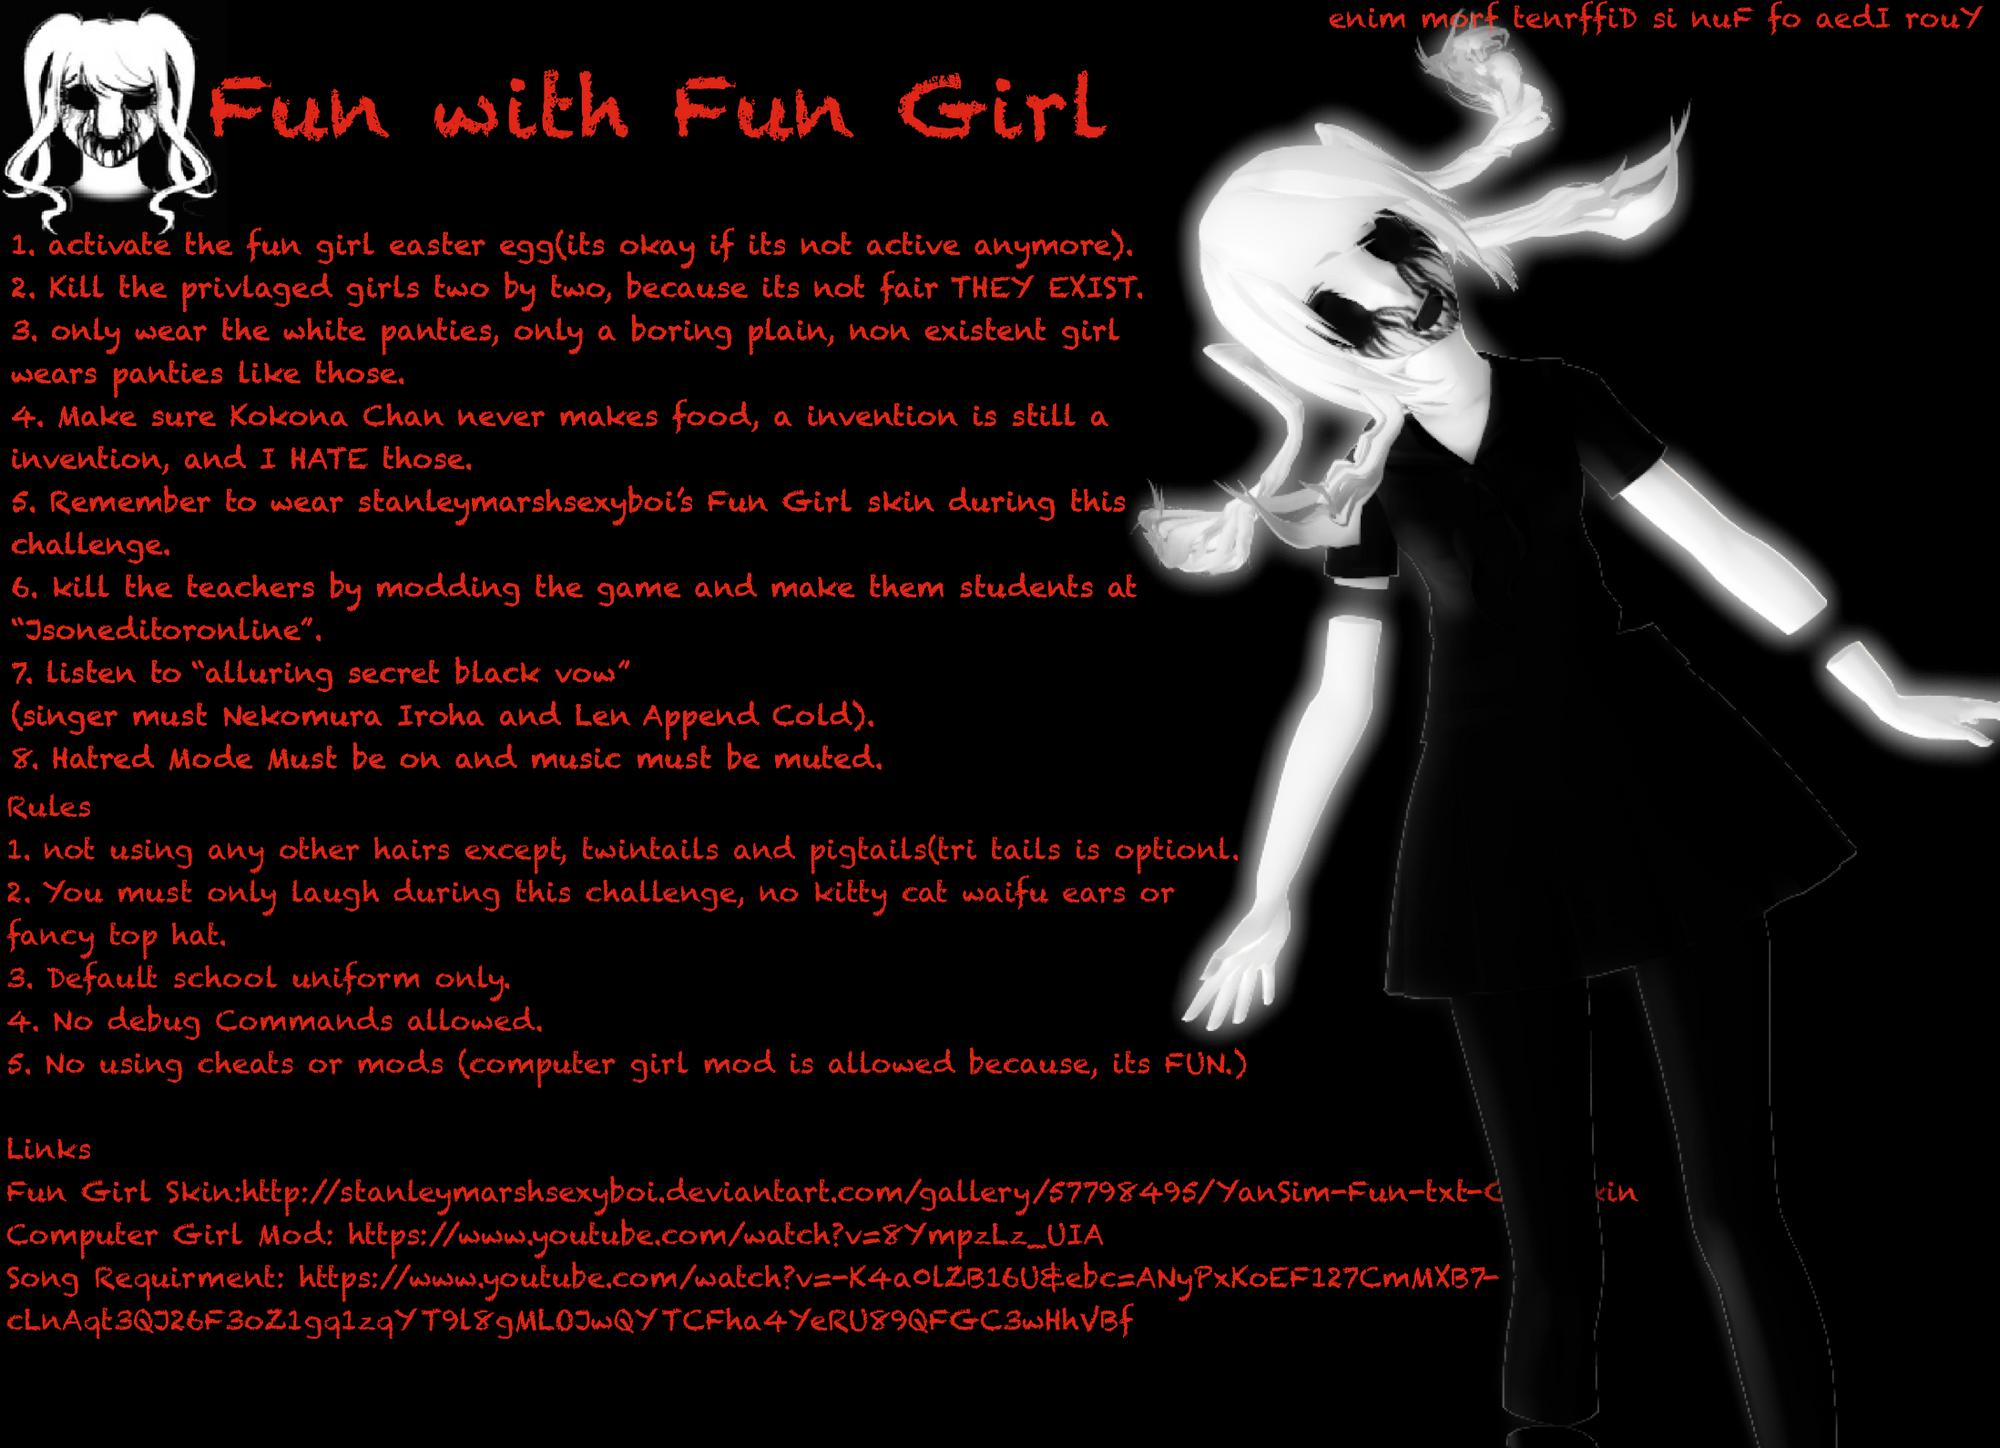 Image fun girl challengepng png yandere simulator wiki fandom